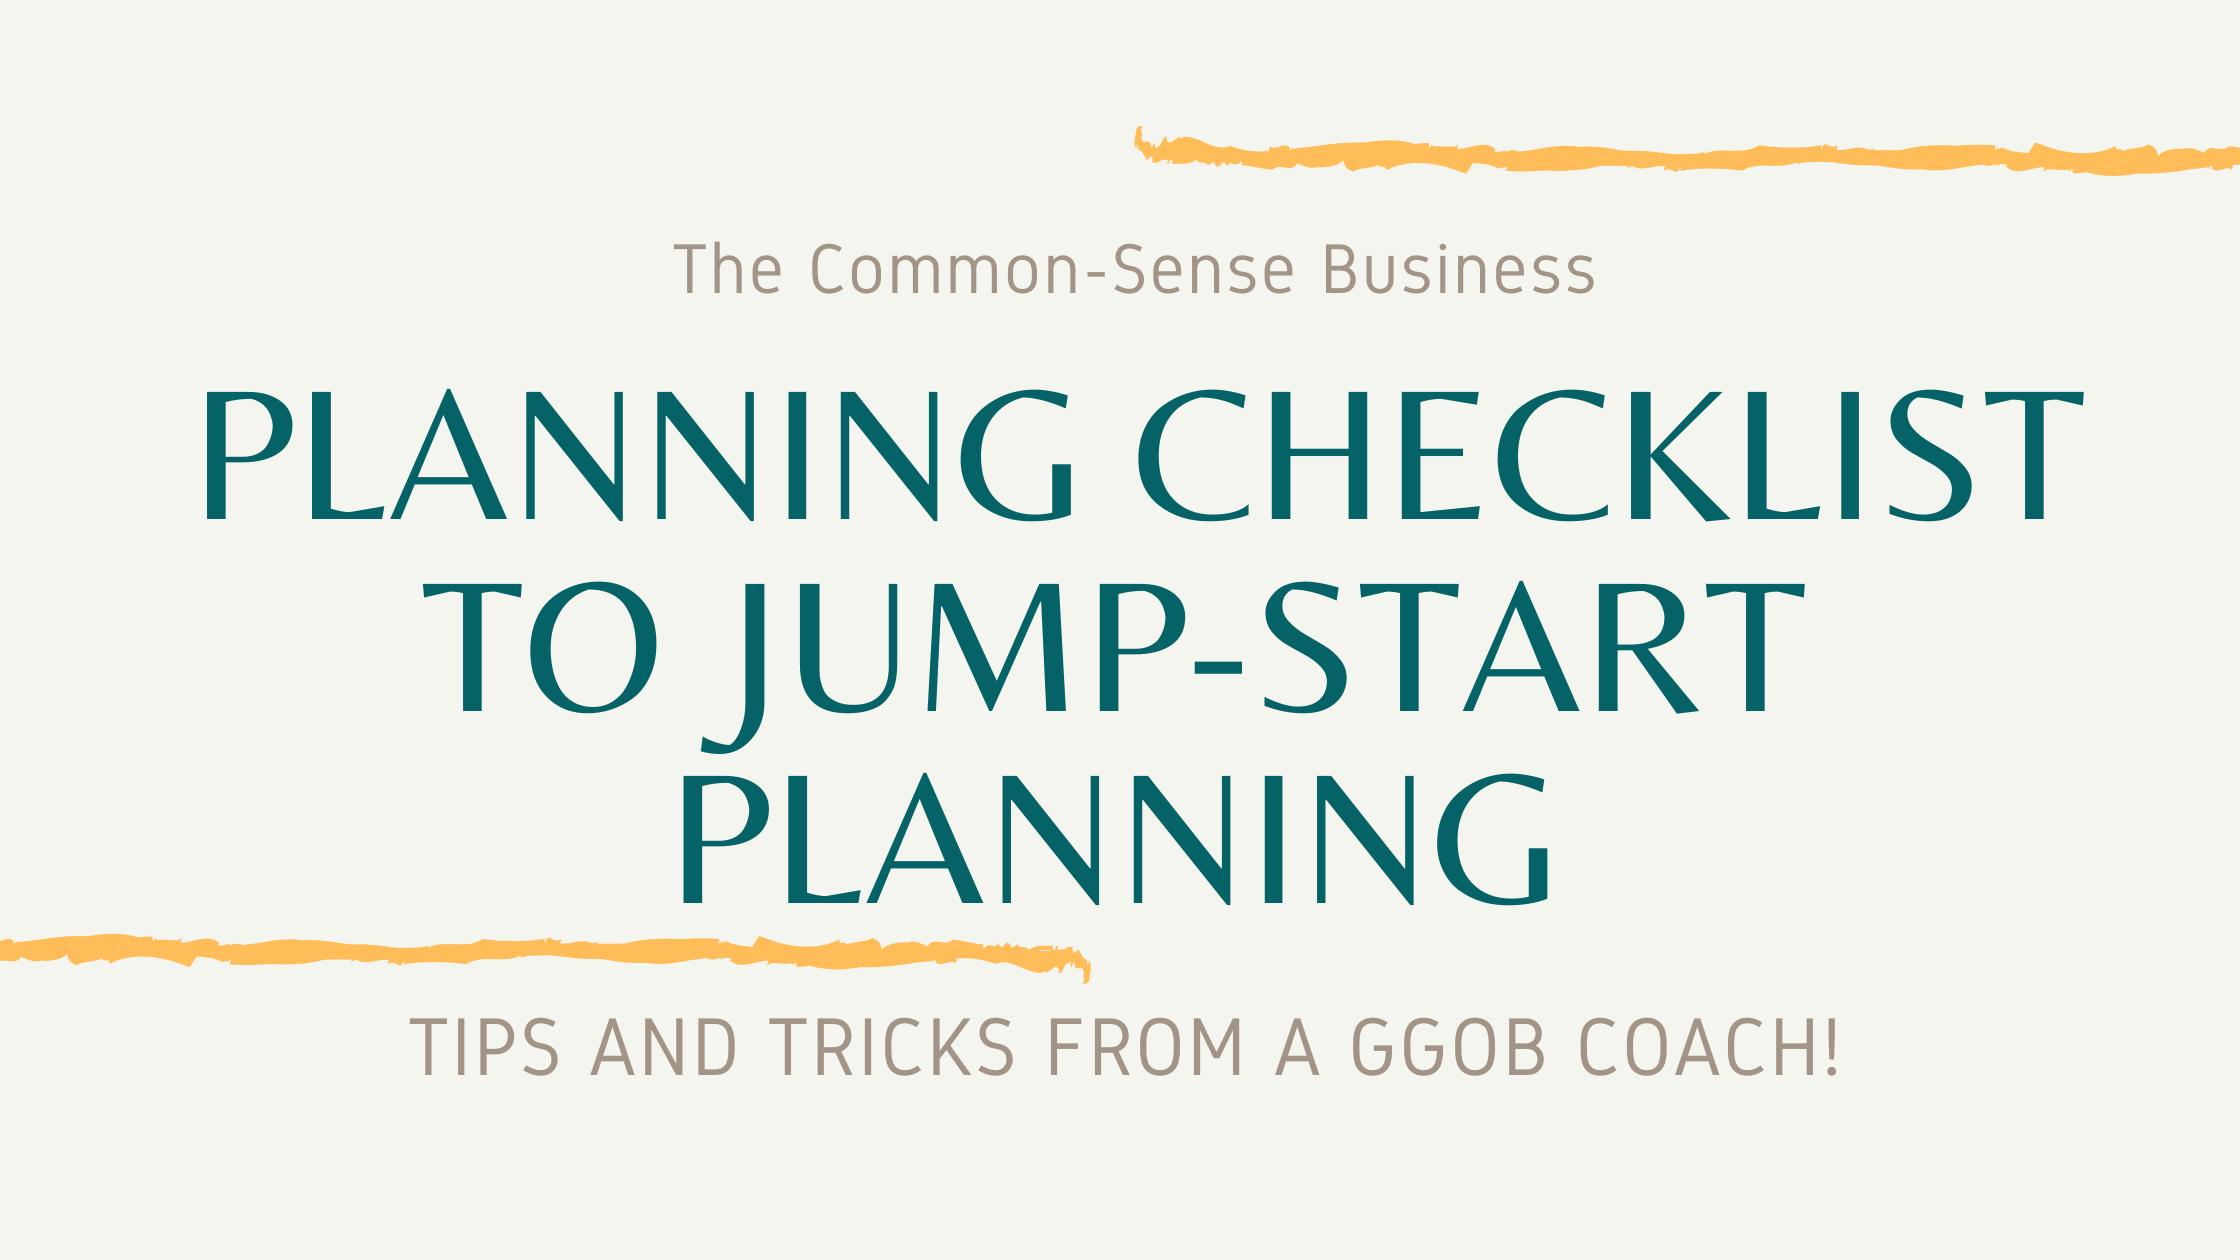 The Common-Sense Business Planning Checklist to Jump-Start Planning